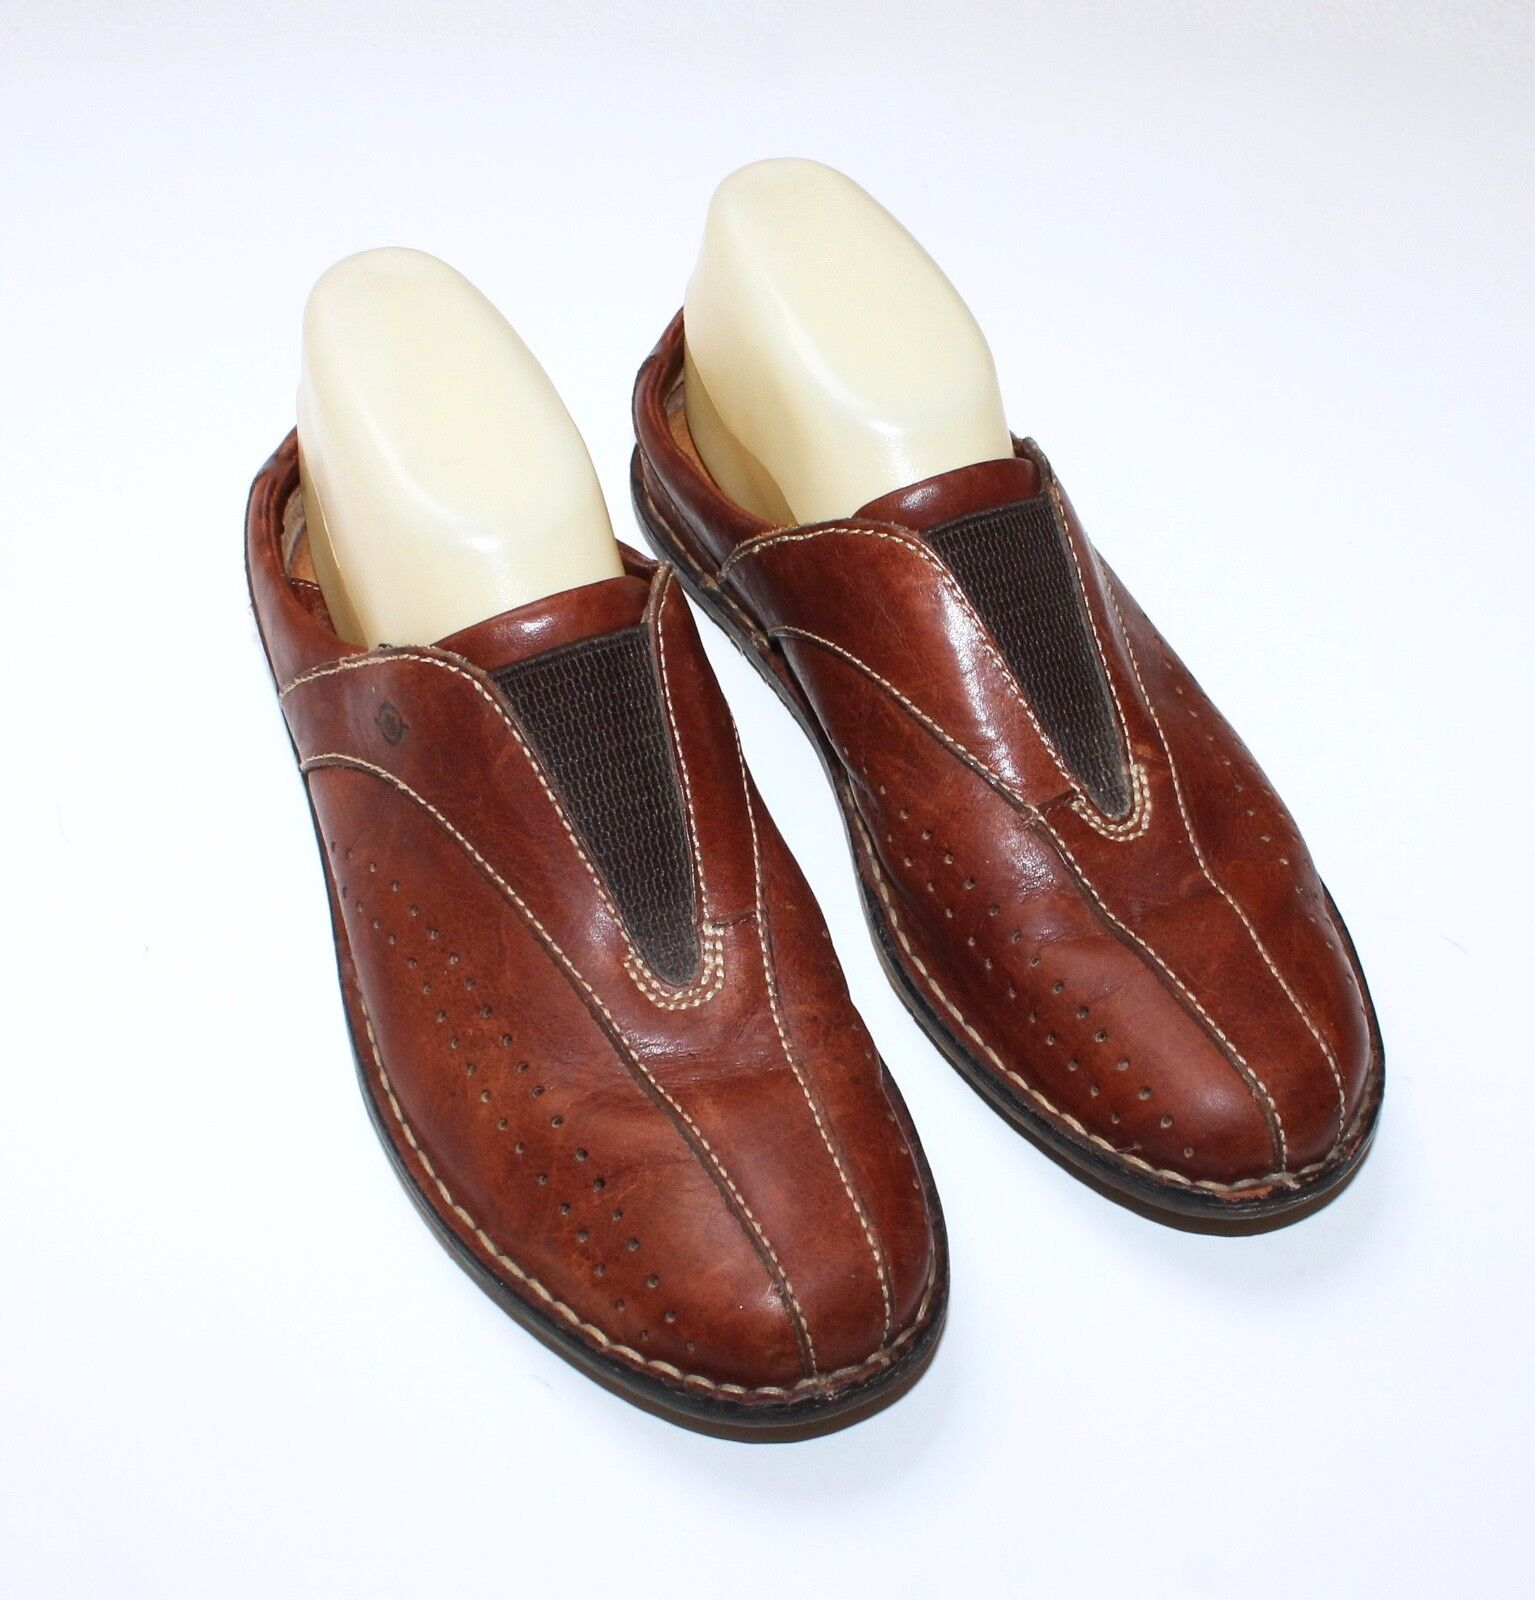 Ladies BORN Brown Leather Mules W7855 - Sz 8 M/W 39  - $12.99